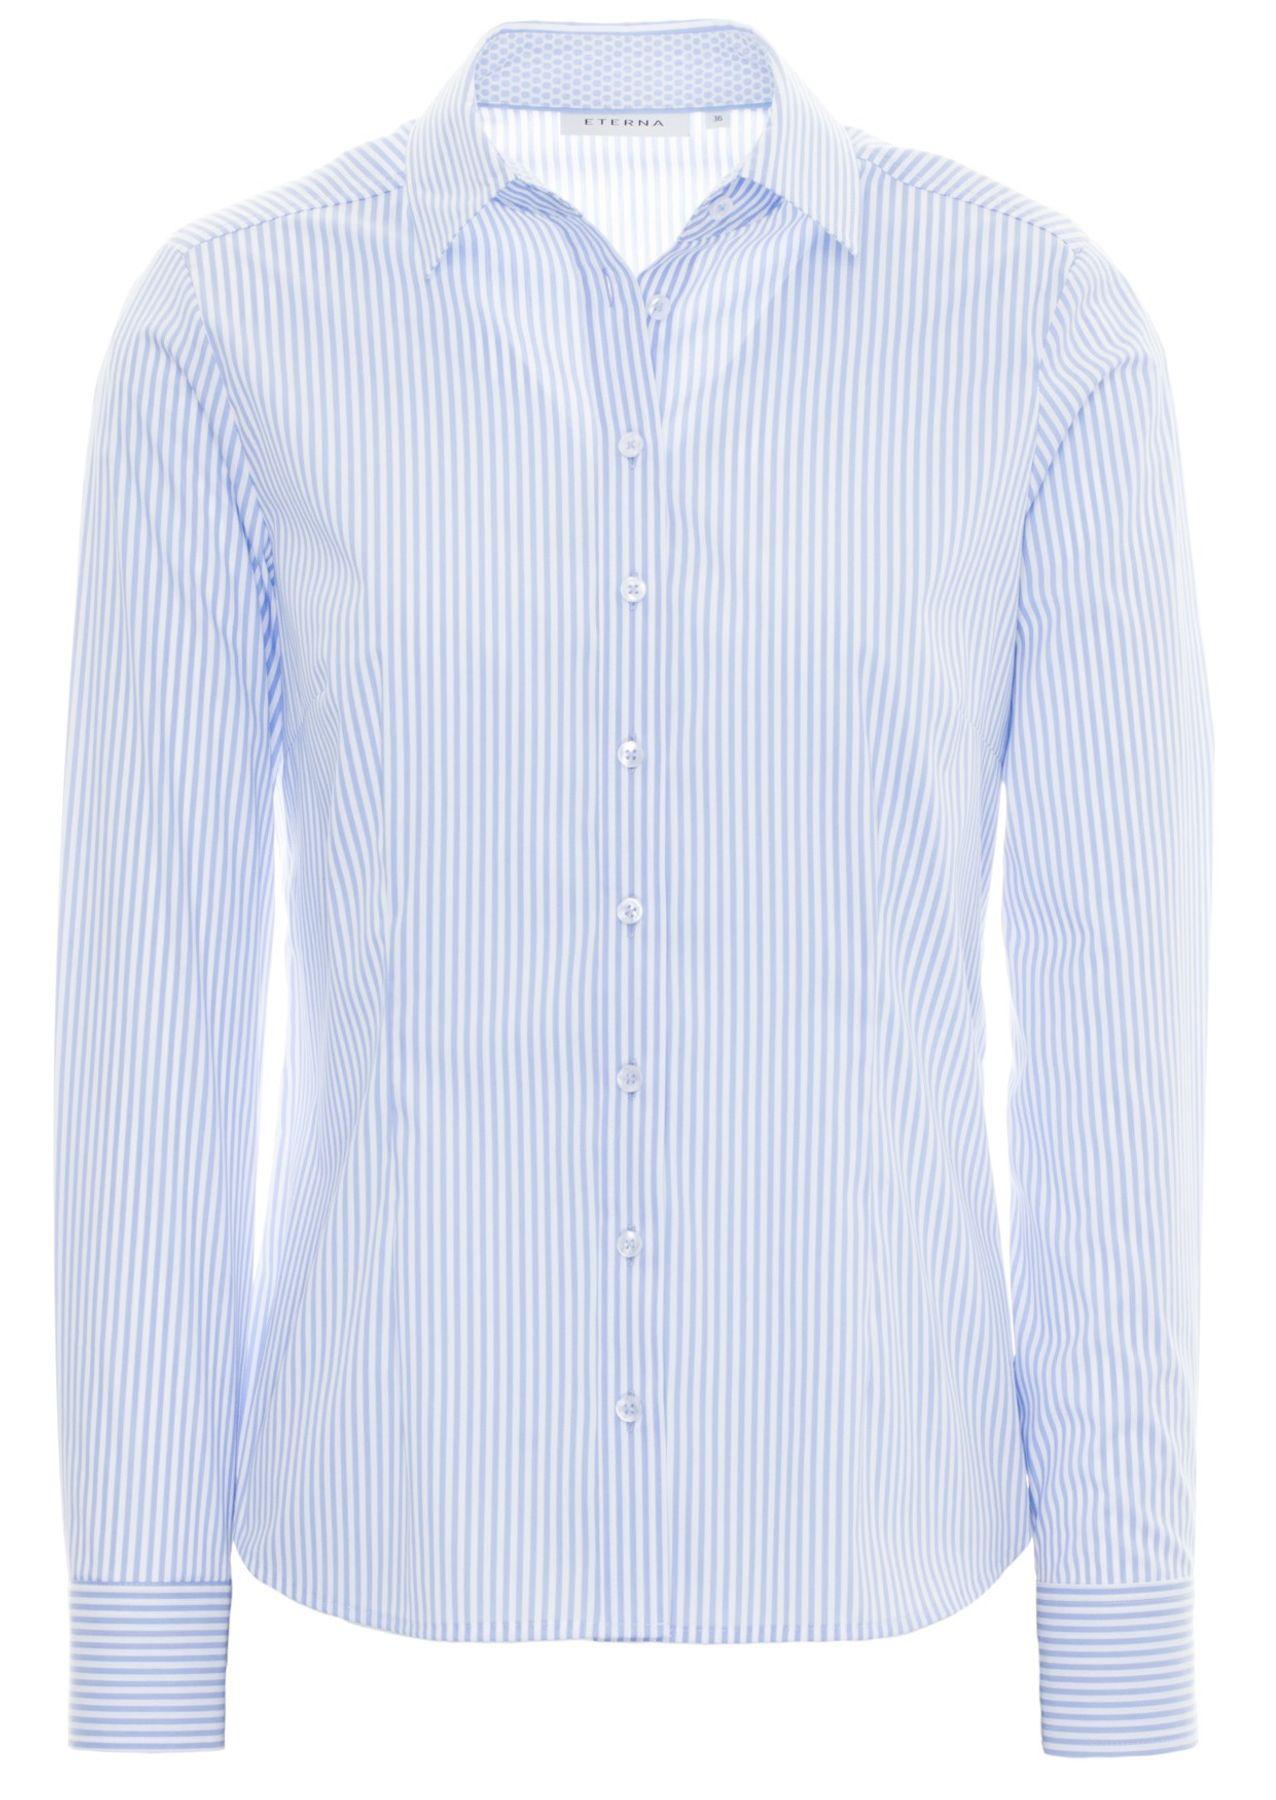 Eterna -  Comfort-Fit - Damen Langarm Bluse in Dunkelblau/ Weiß gestreift  (6017 D390) – Bild 1